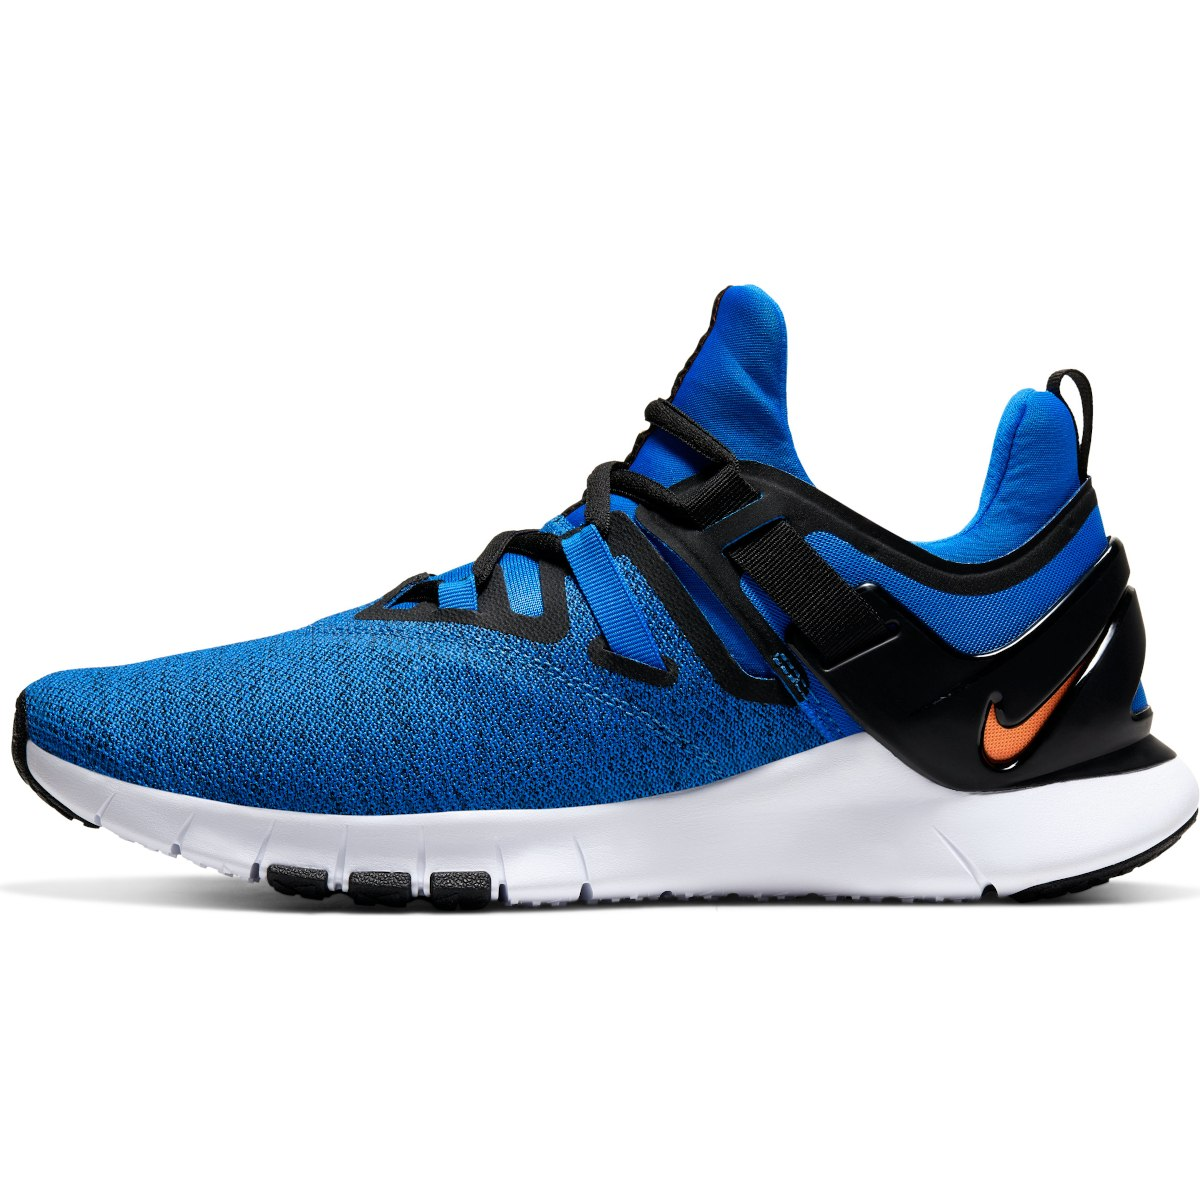 Nike Flexmethod TR Men's Training Shoe - soar/total orange-black-white BQ3063-400